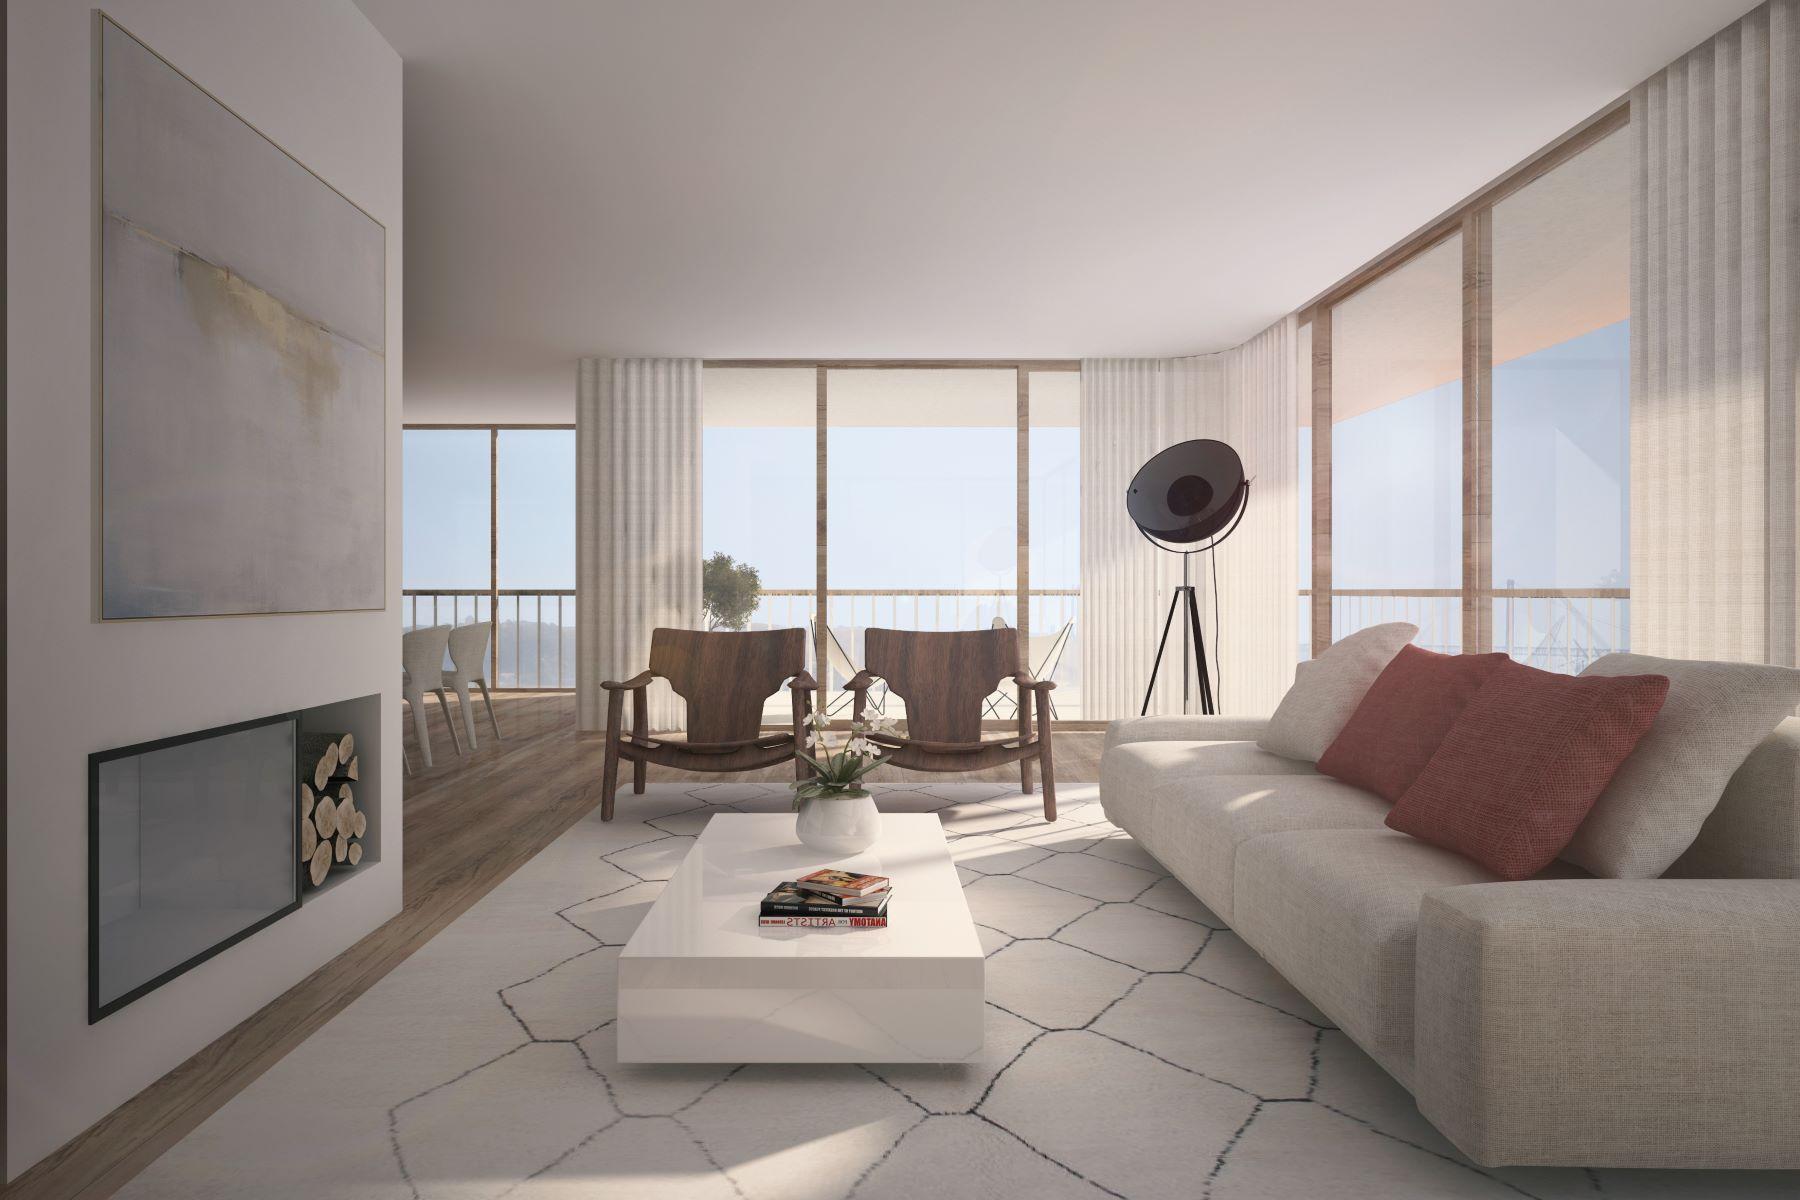 Apartments for Sale at Flat, 5 bedrooms, for Sale 24 De Julho, Lisboa, Lisboa Portugal